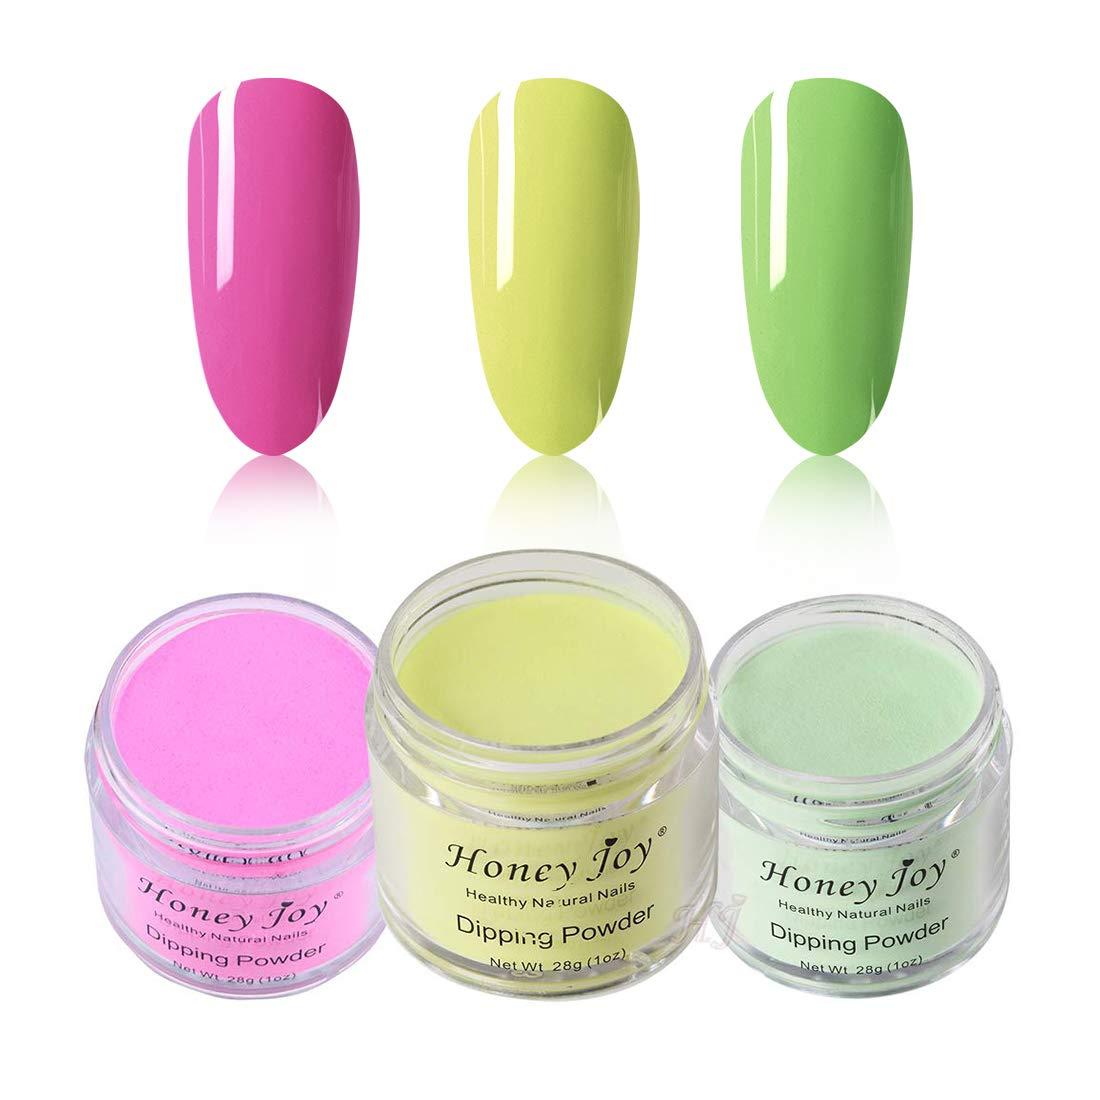 3pcs 28g/Box Fine Dipping Powder No Need Lamp Cure Dip Powder Nails,Colorful Dark Pink,Shine Yellow,Light Green,Like Gel Polish Effect, Even & Smooth Finishing(34-42-39)